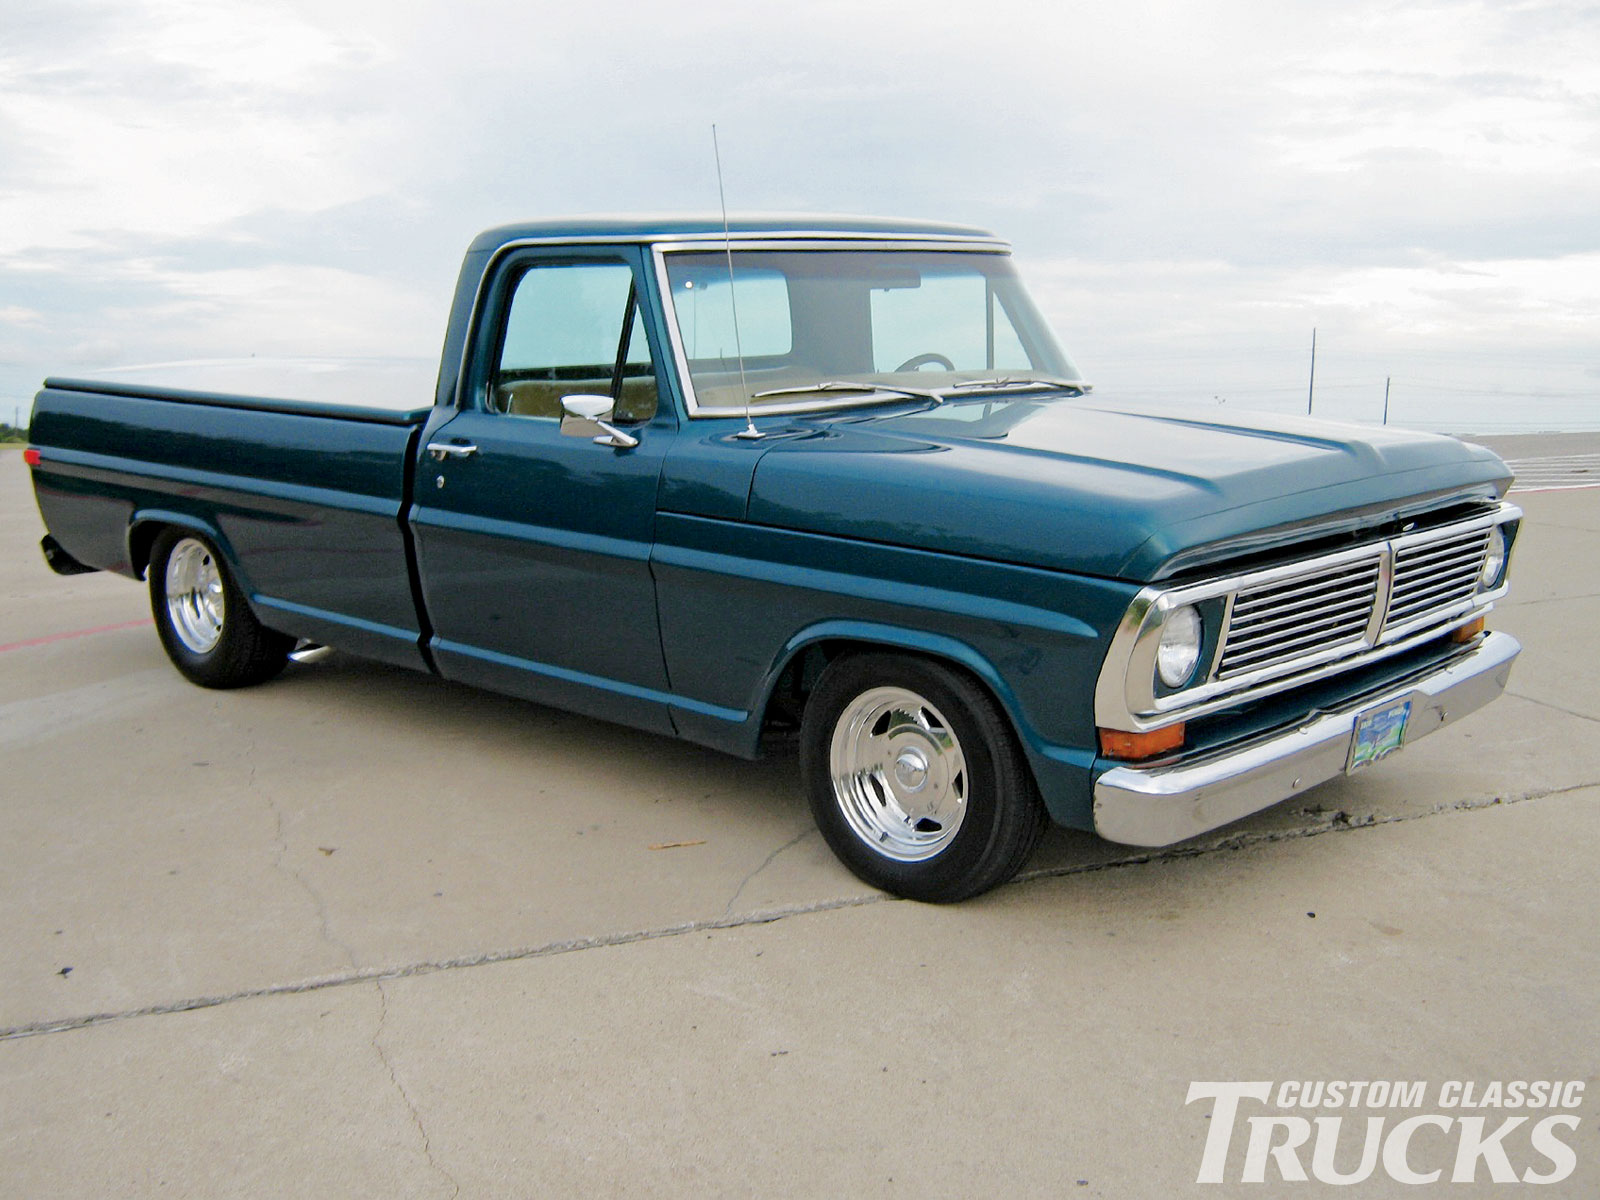 1970 ford f100 pickup truck restored vintage truck HD Background 1600x1200